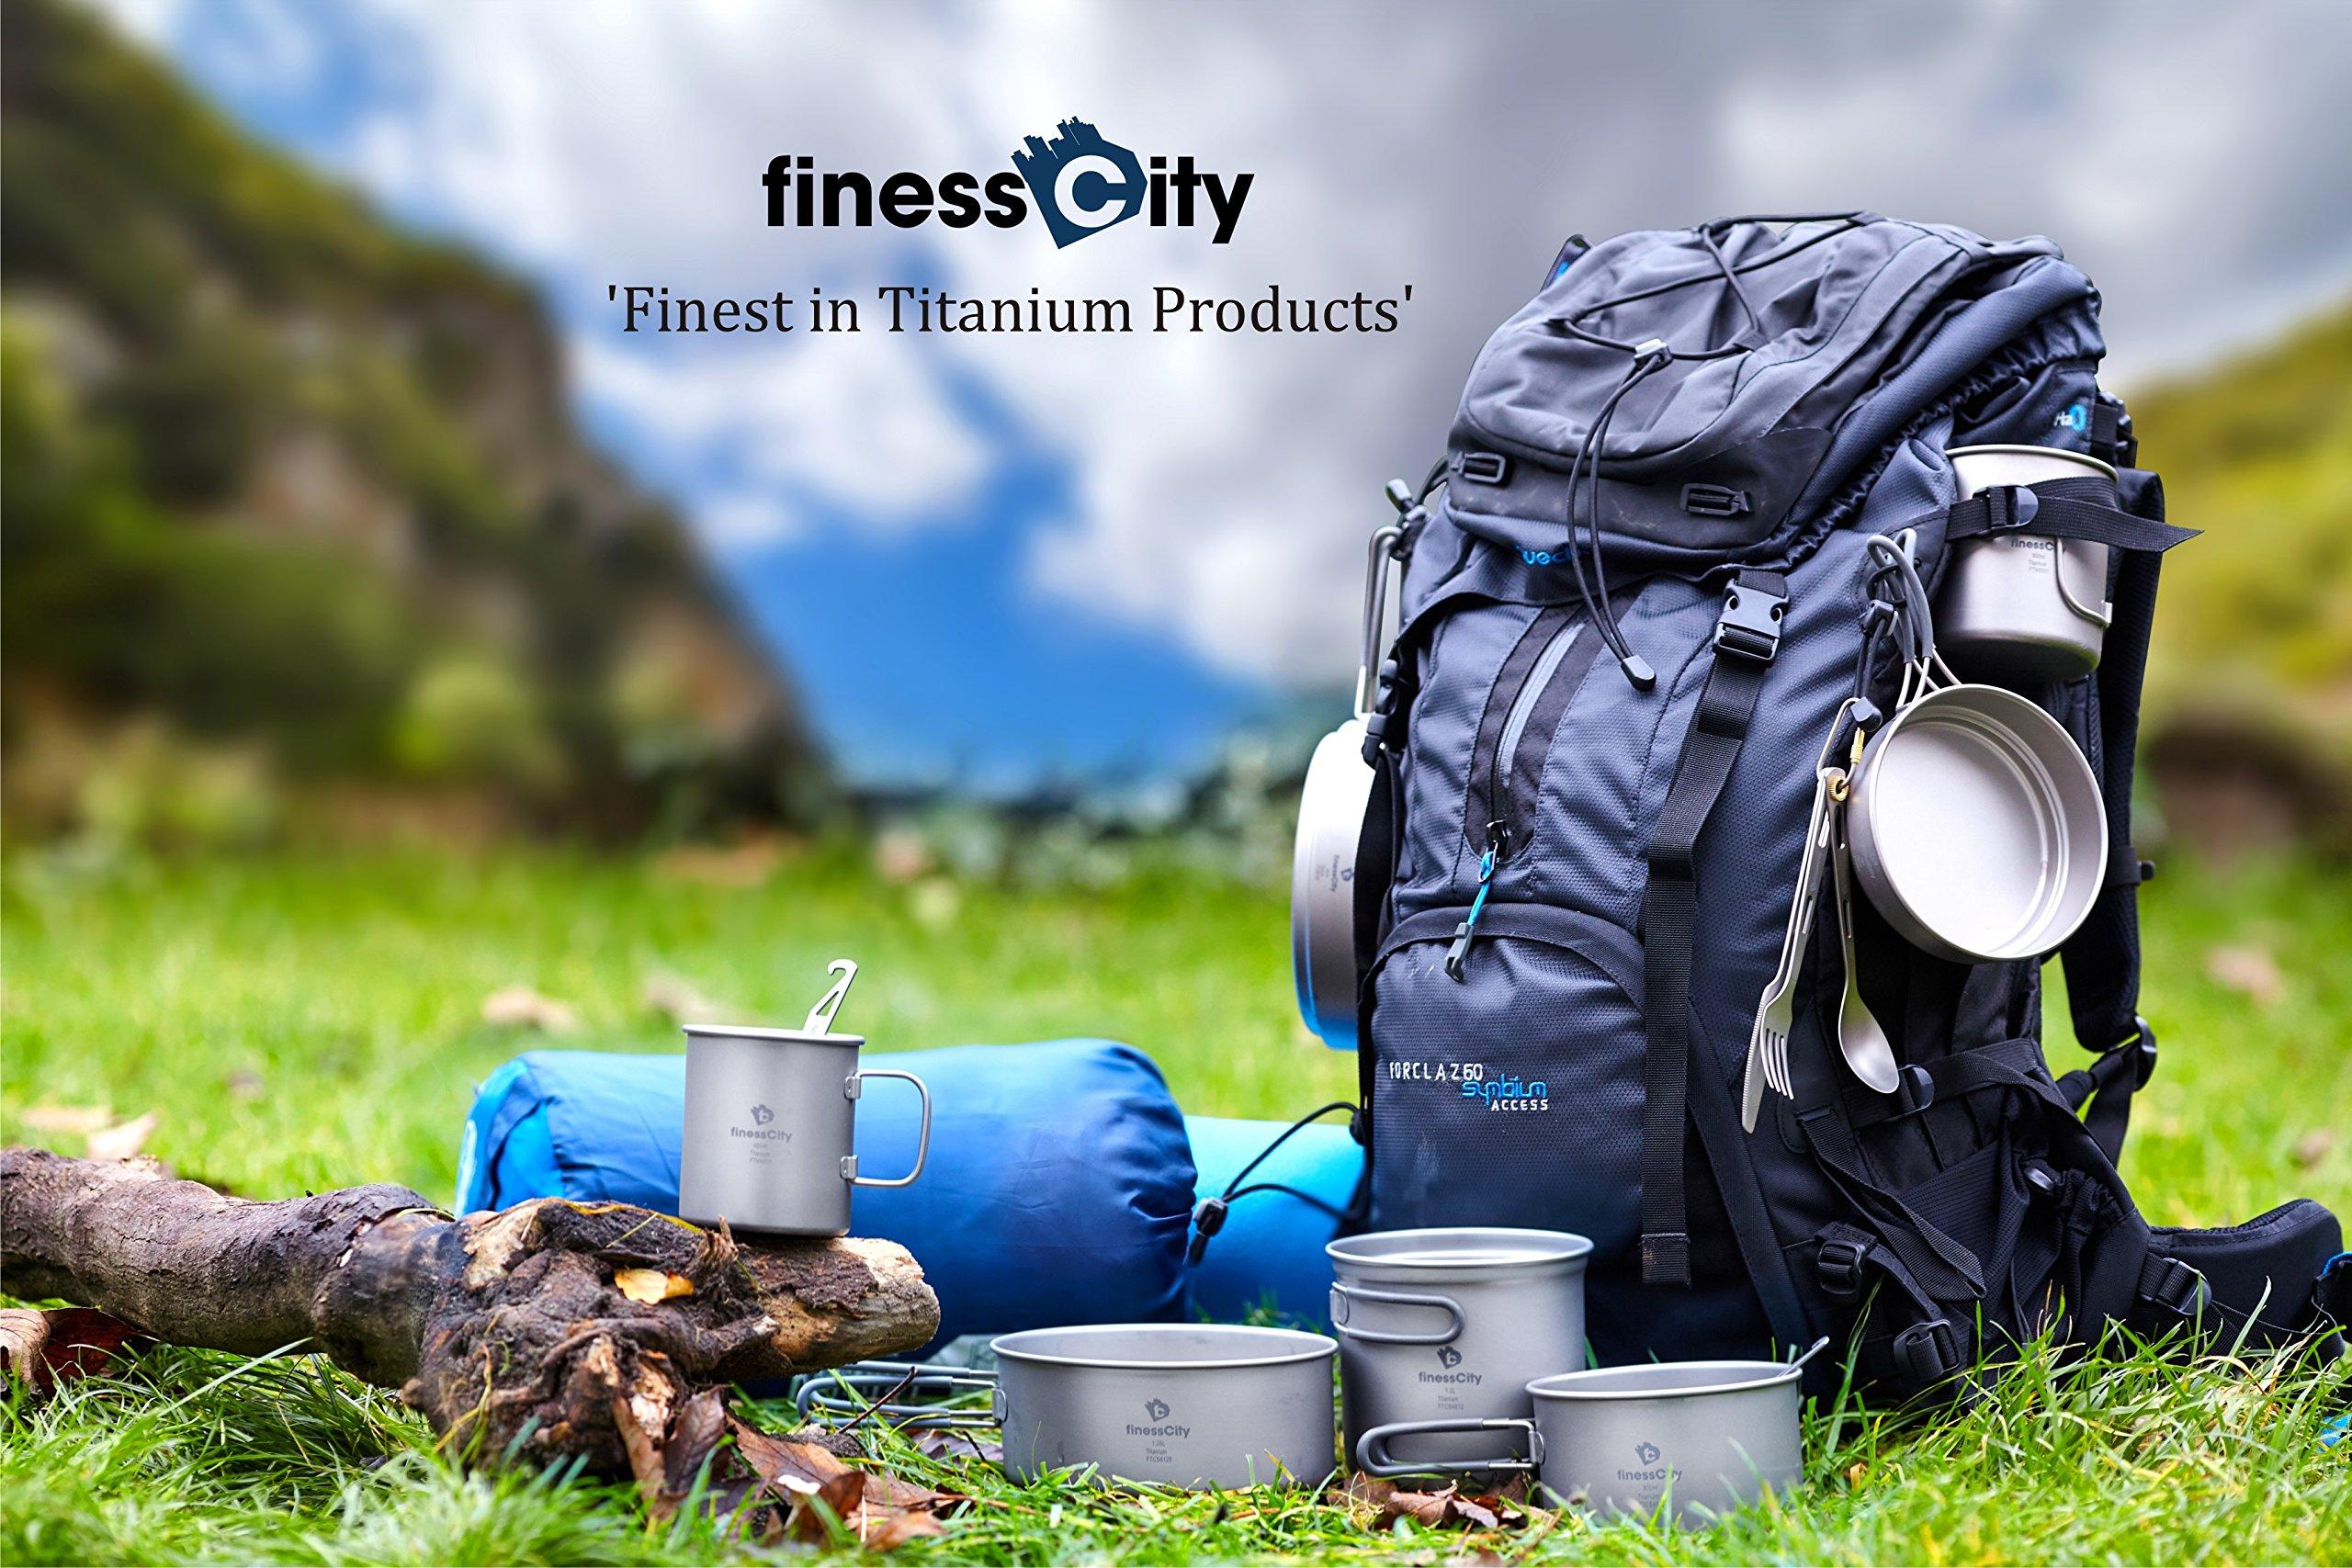 finessCity Titanium Utility Cutlery Set Extra Strong Ultra Lightweight (Ti), 3/4/5 Piece Straw Chopsticks Knife Fork…